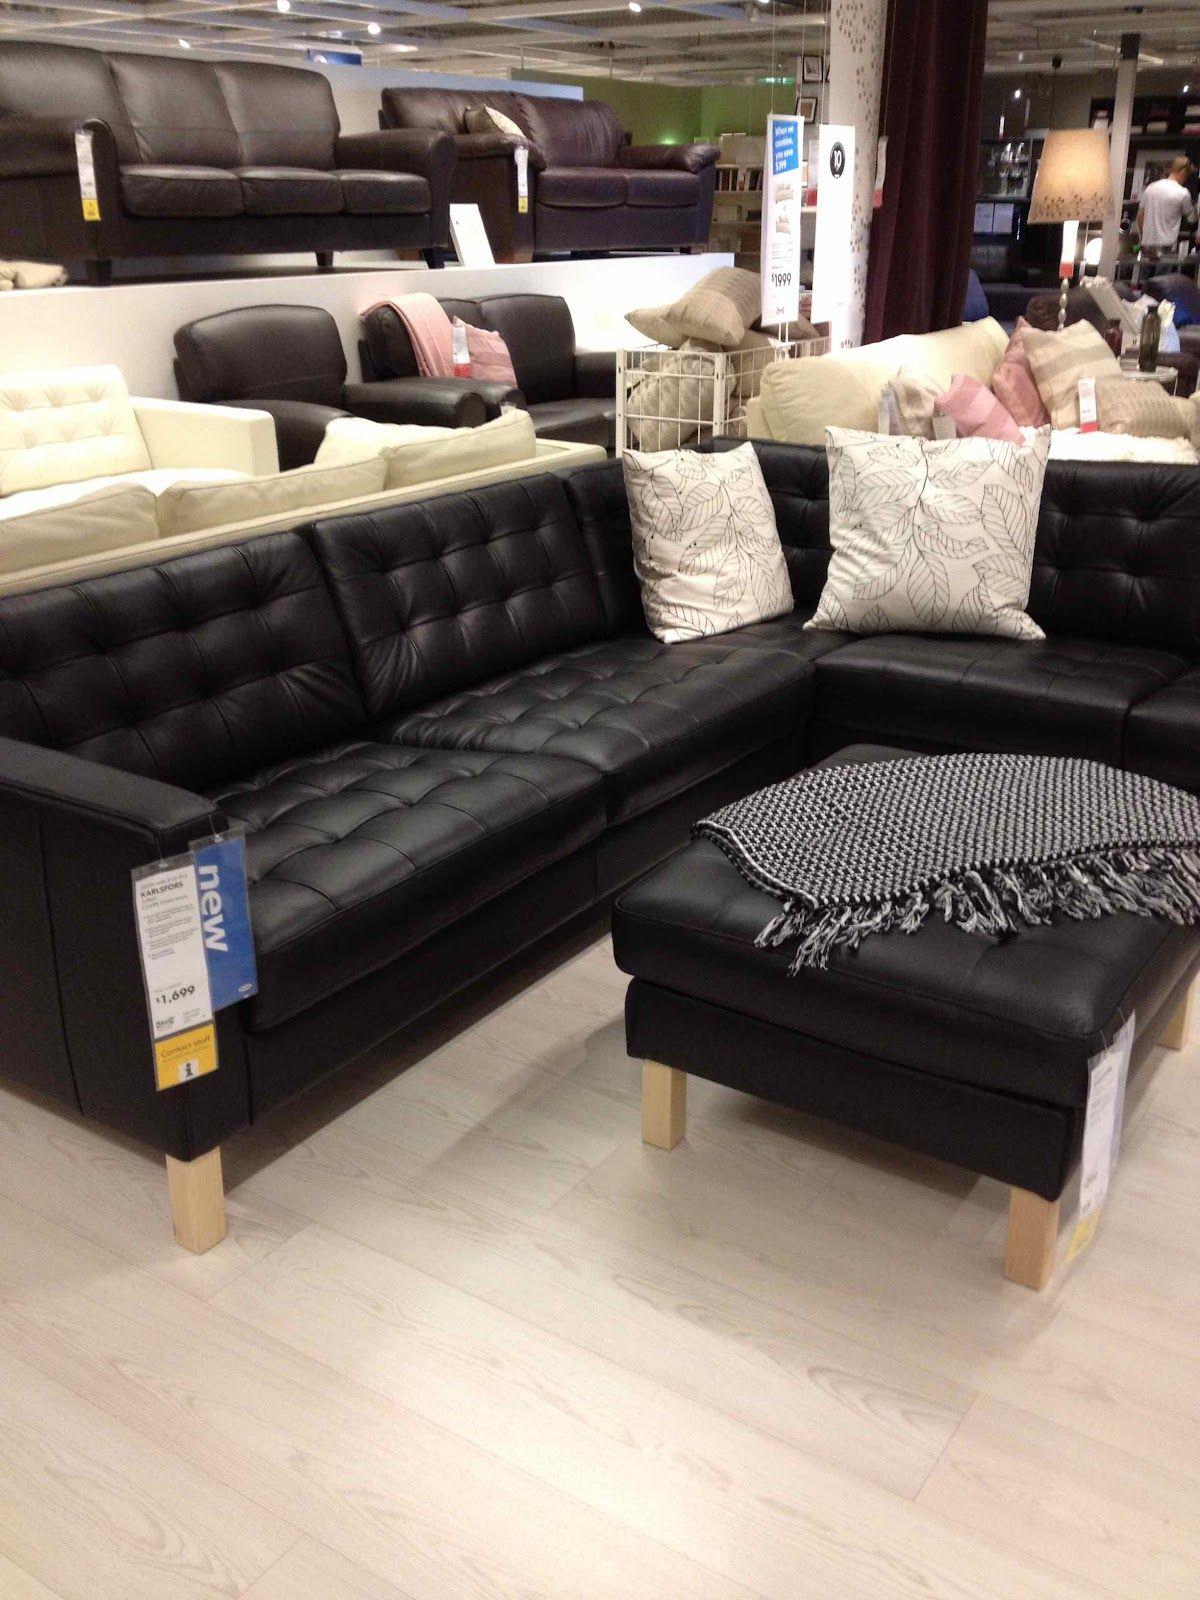 Ikea Karlsfors Black Ikea Leather Sofa Faux Leather Couch Black Leather Couch